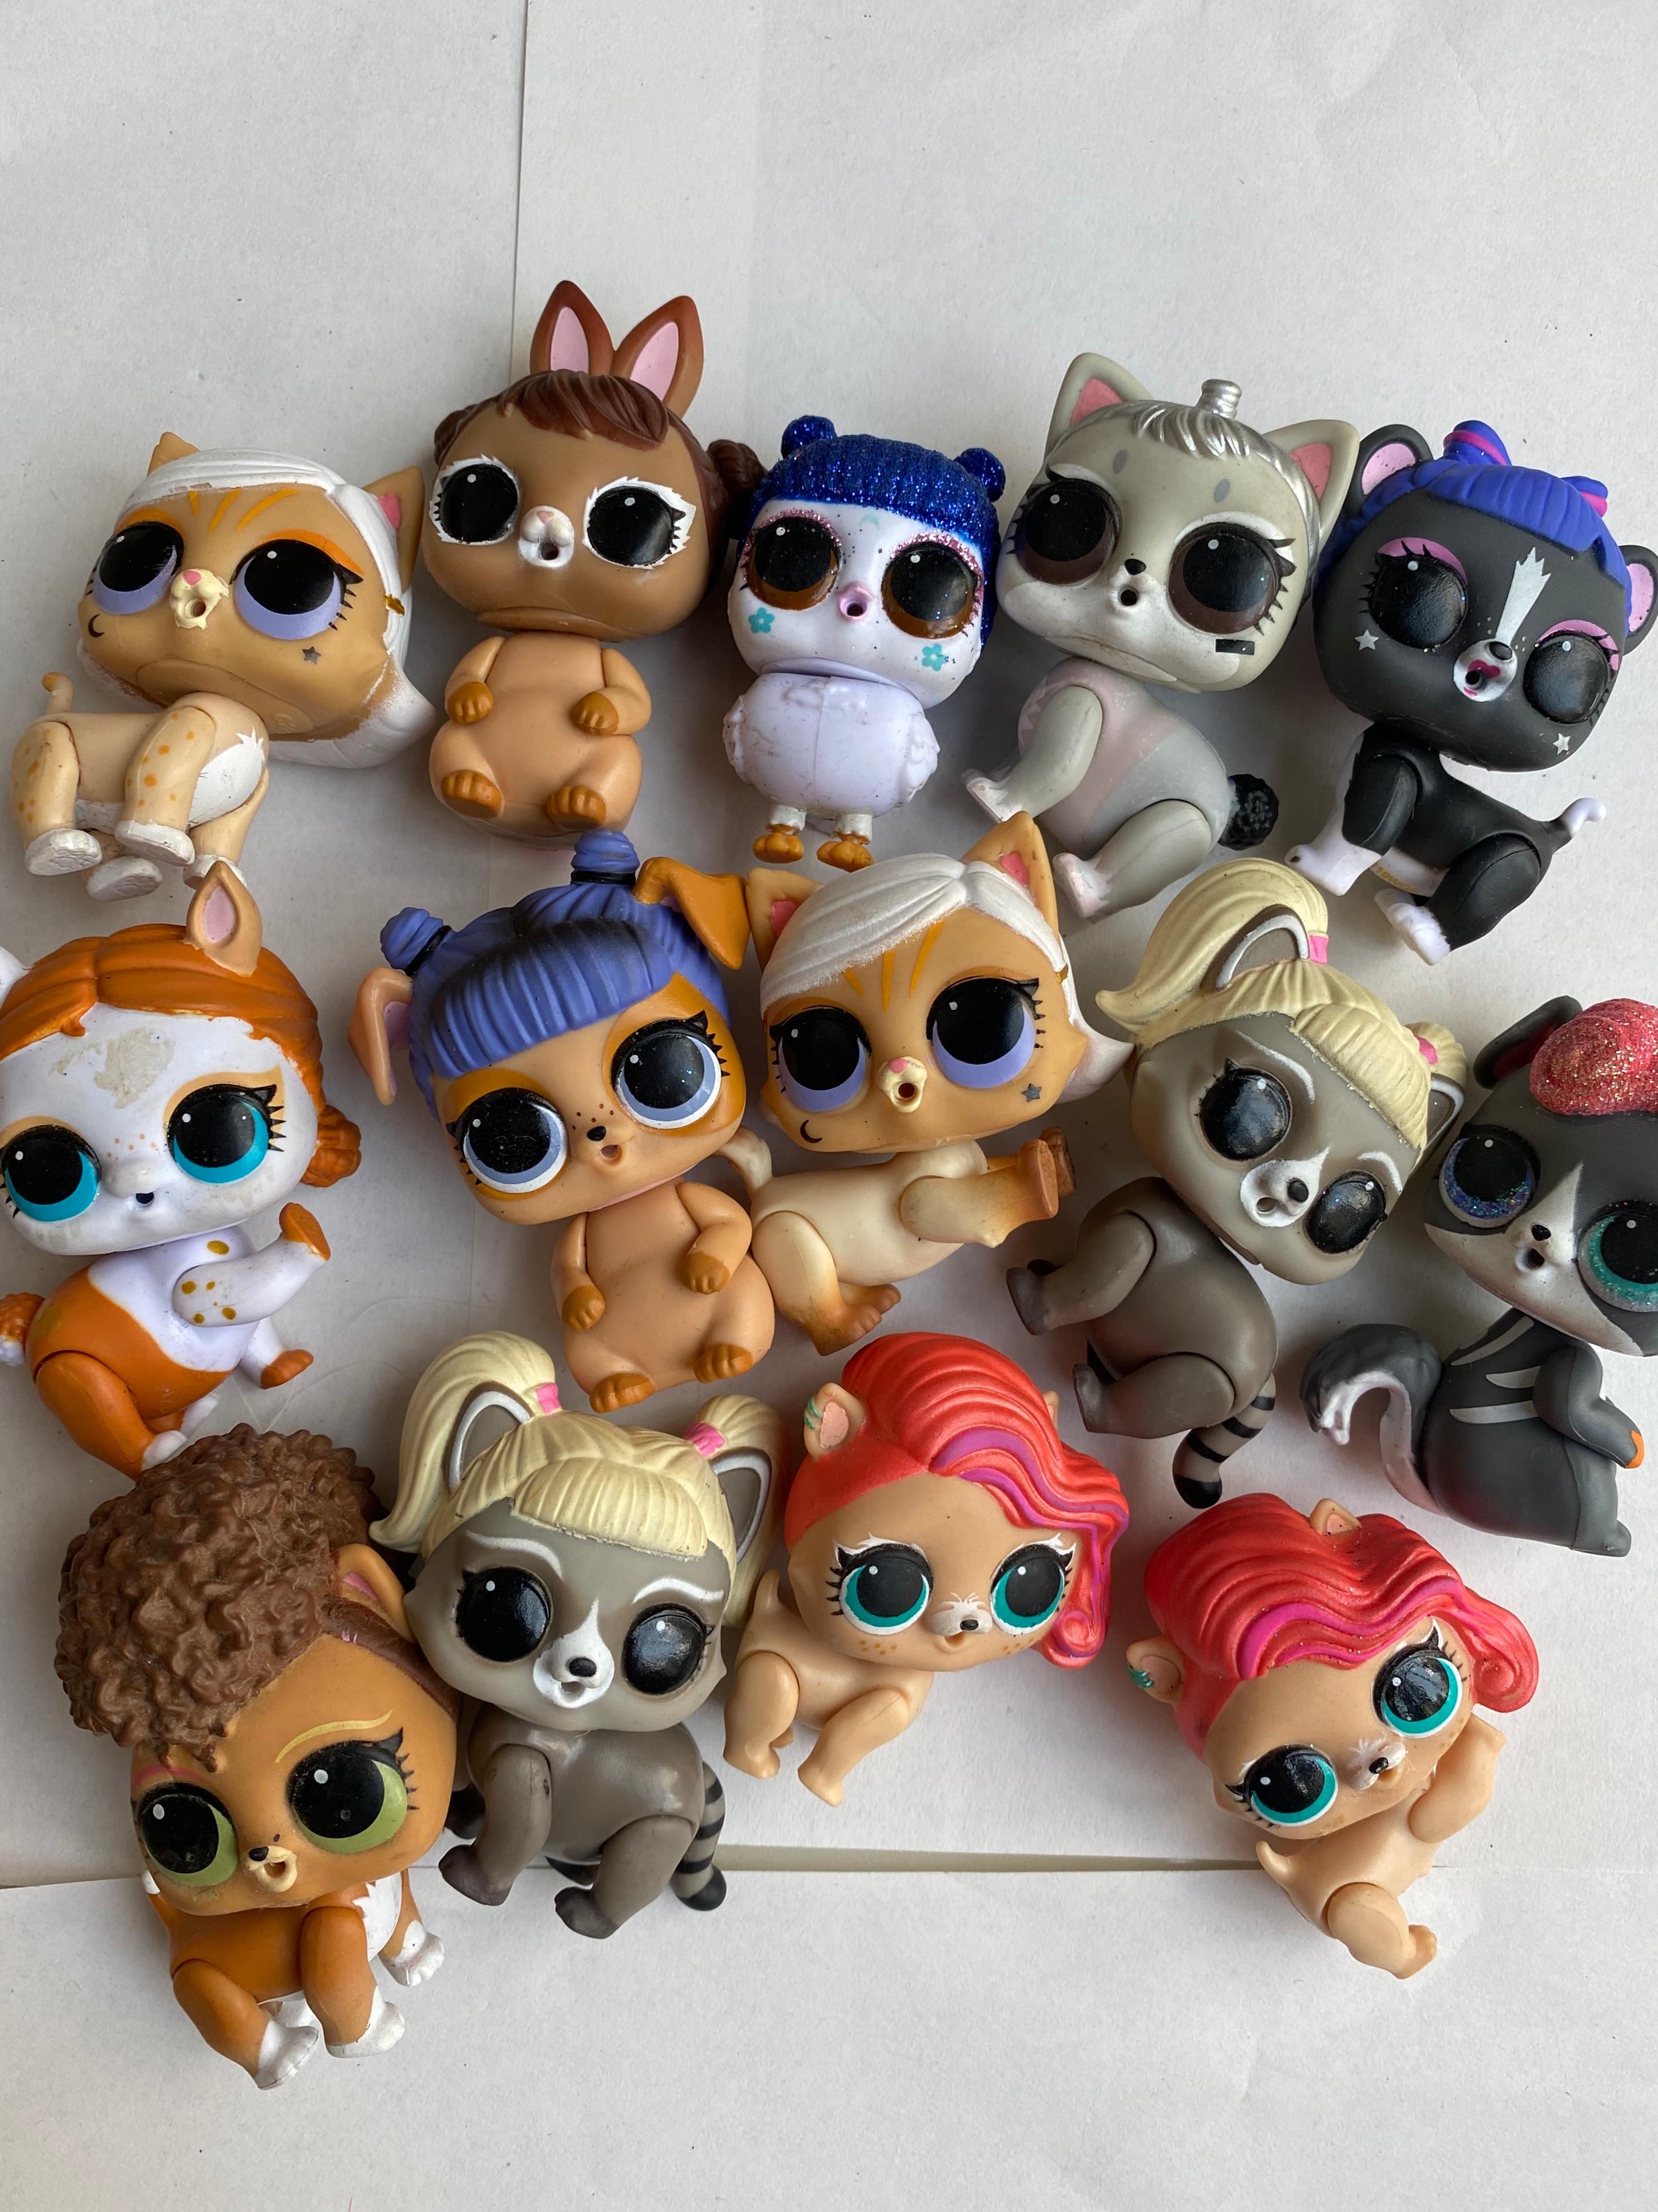 5pcs/set LOL doll Surprise Original pets Dolls Action Figure Model Girl Christmas gift toys for chil